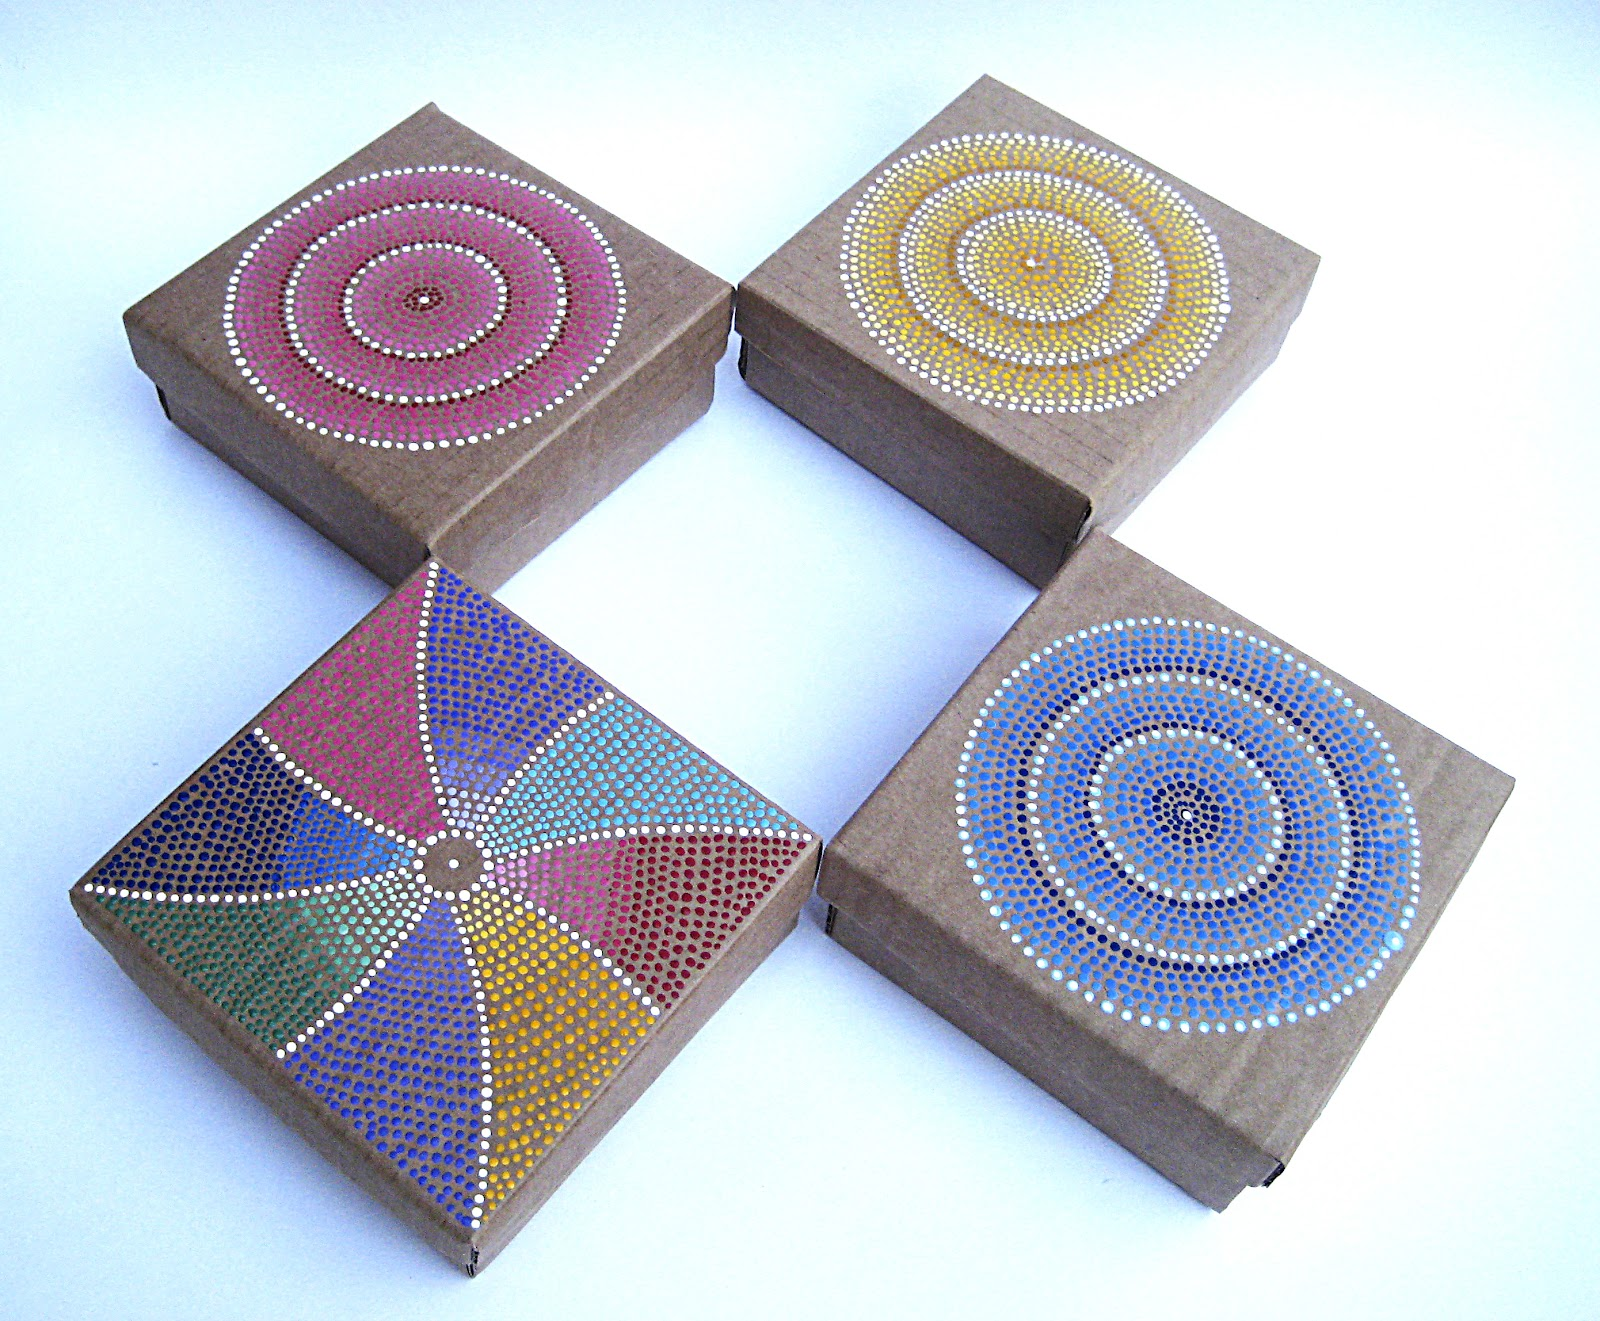 Malena valc rcel original art cajas de cart n reciclado for Tecnica para pintar piedras